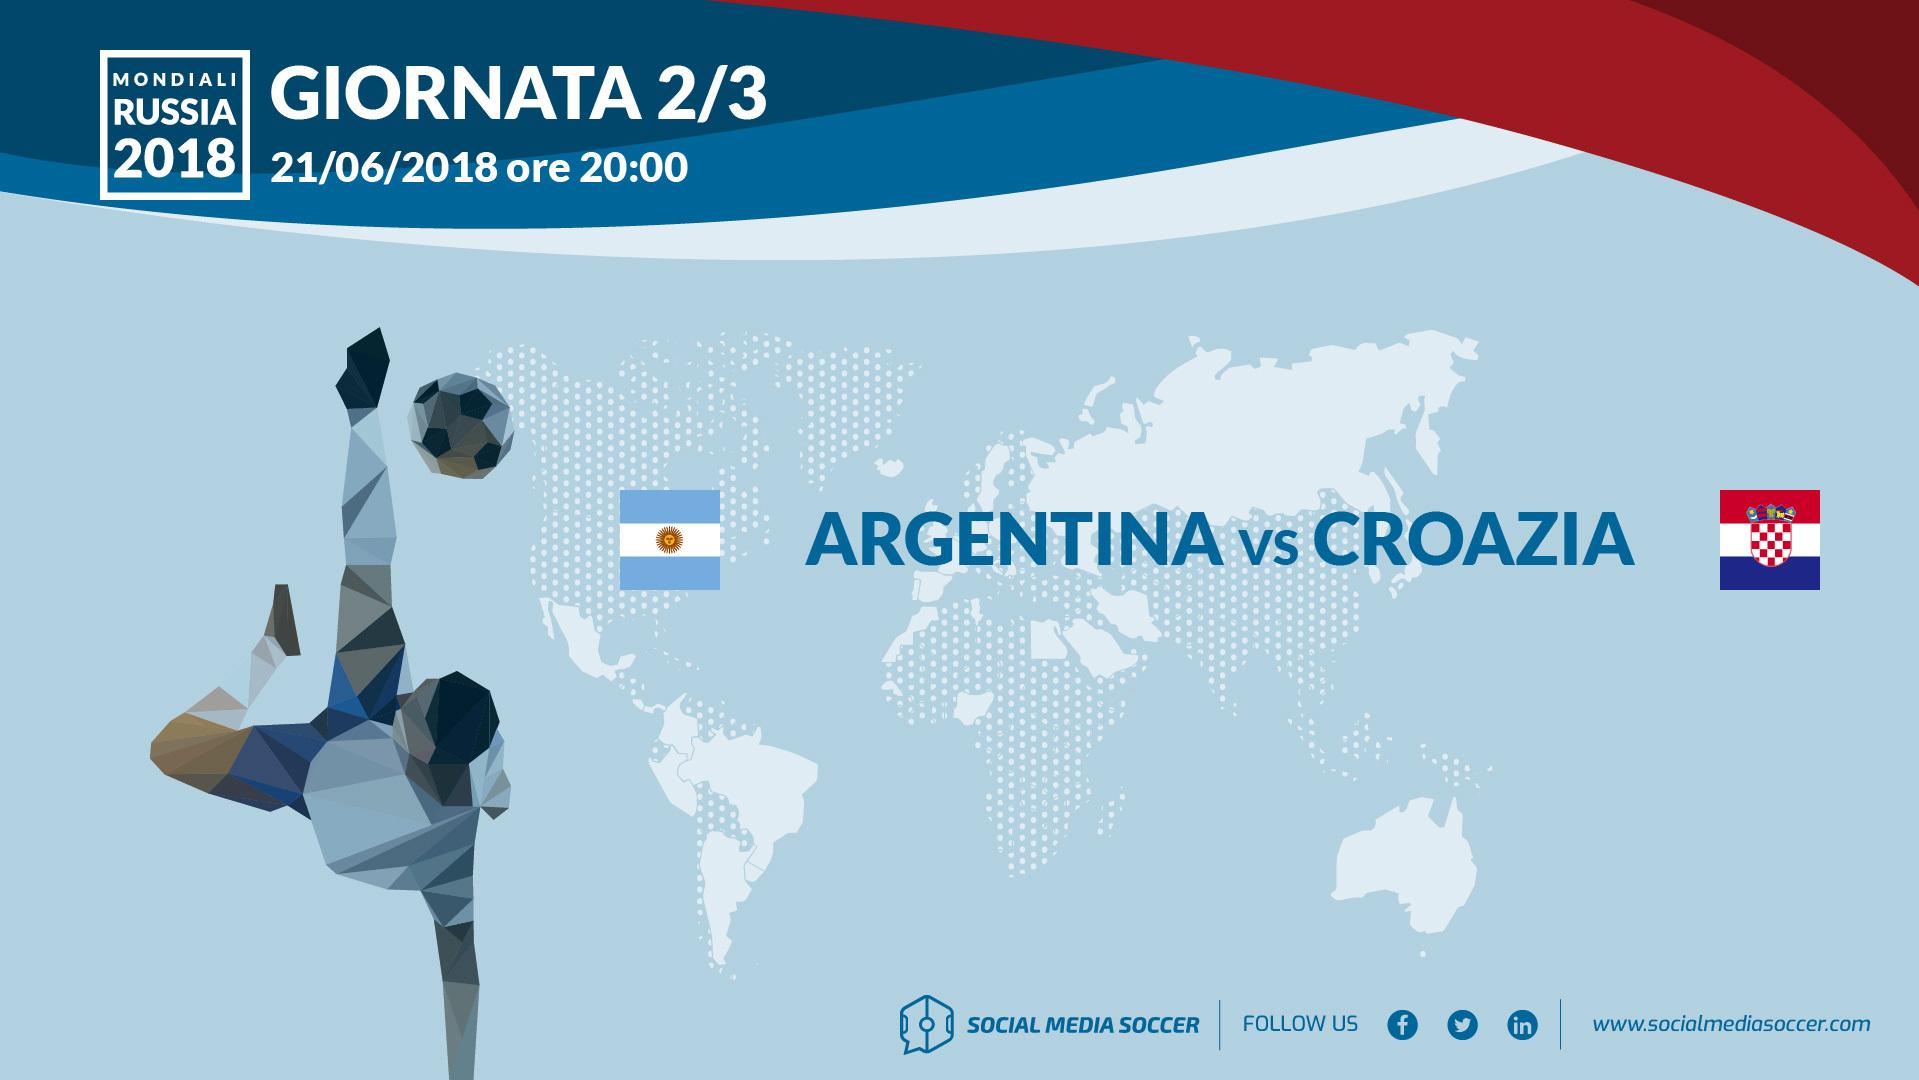 Mondiali 2018 Social Argentina-Croazia